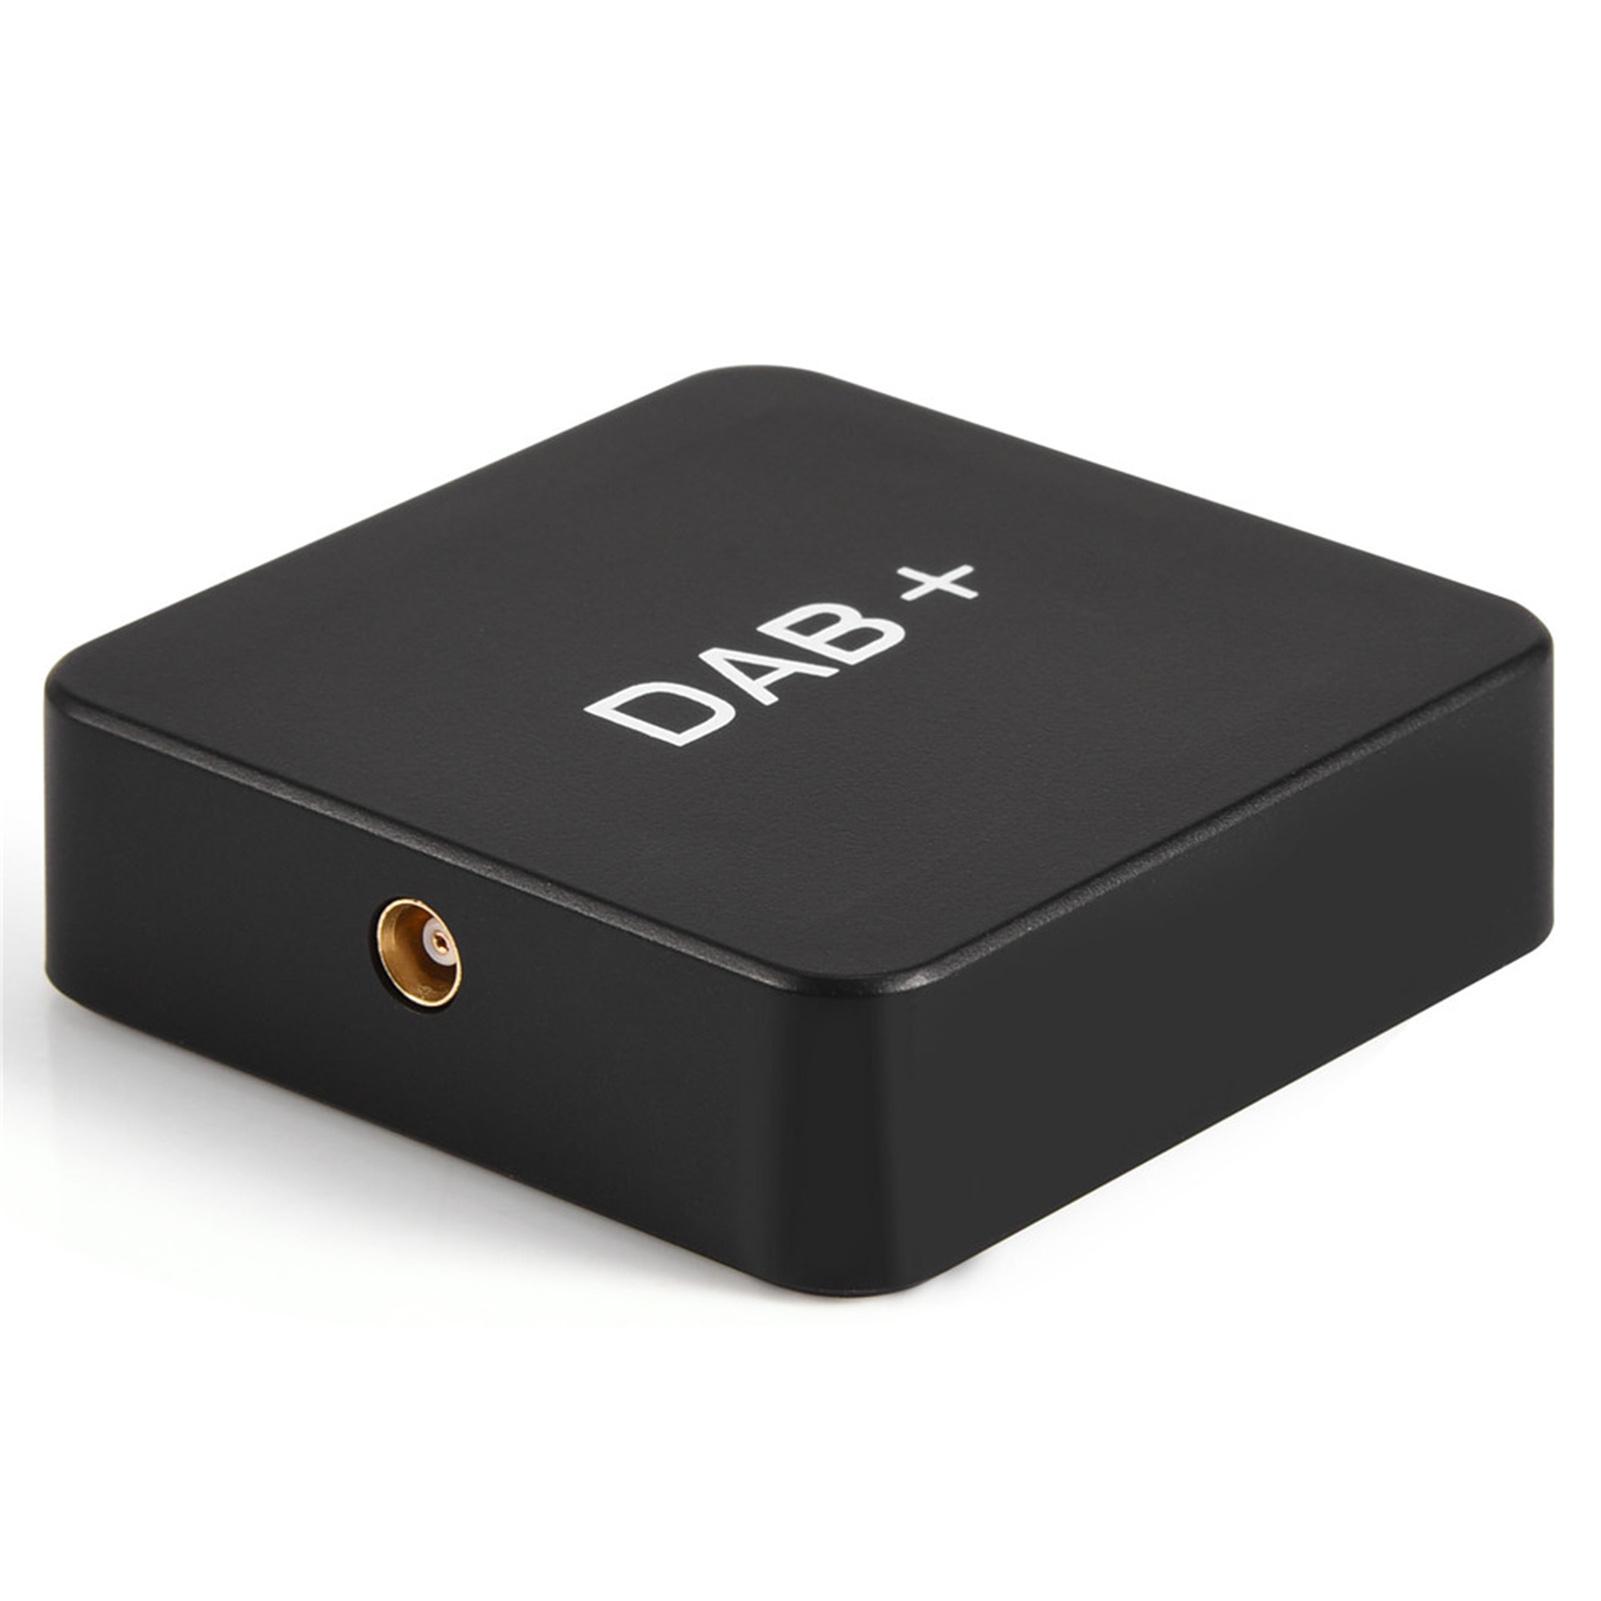 universal auto dab box digital radio empf nger adapter. Black Bedroom Furniture Sets. Home Design Ideas